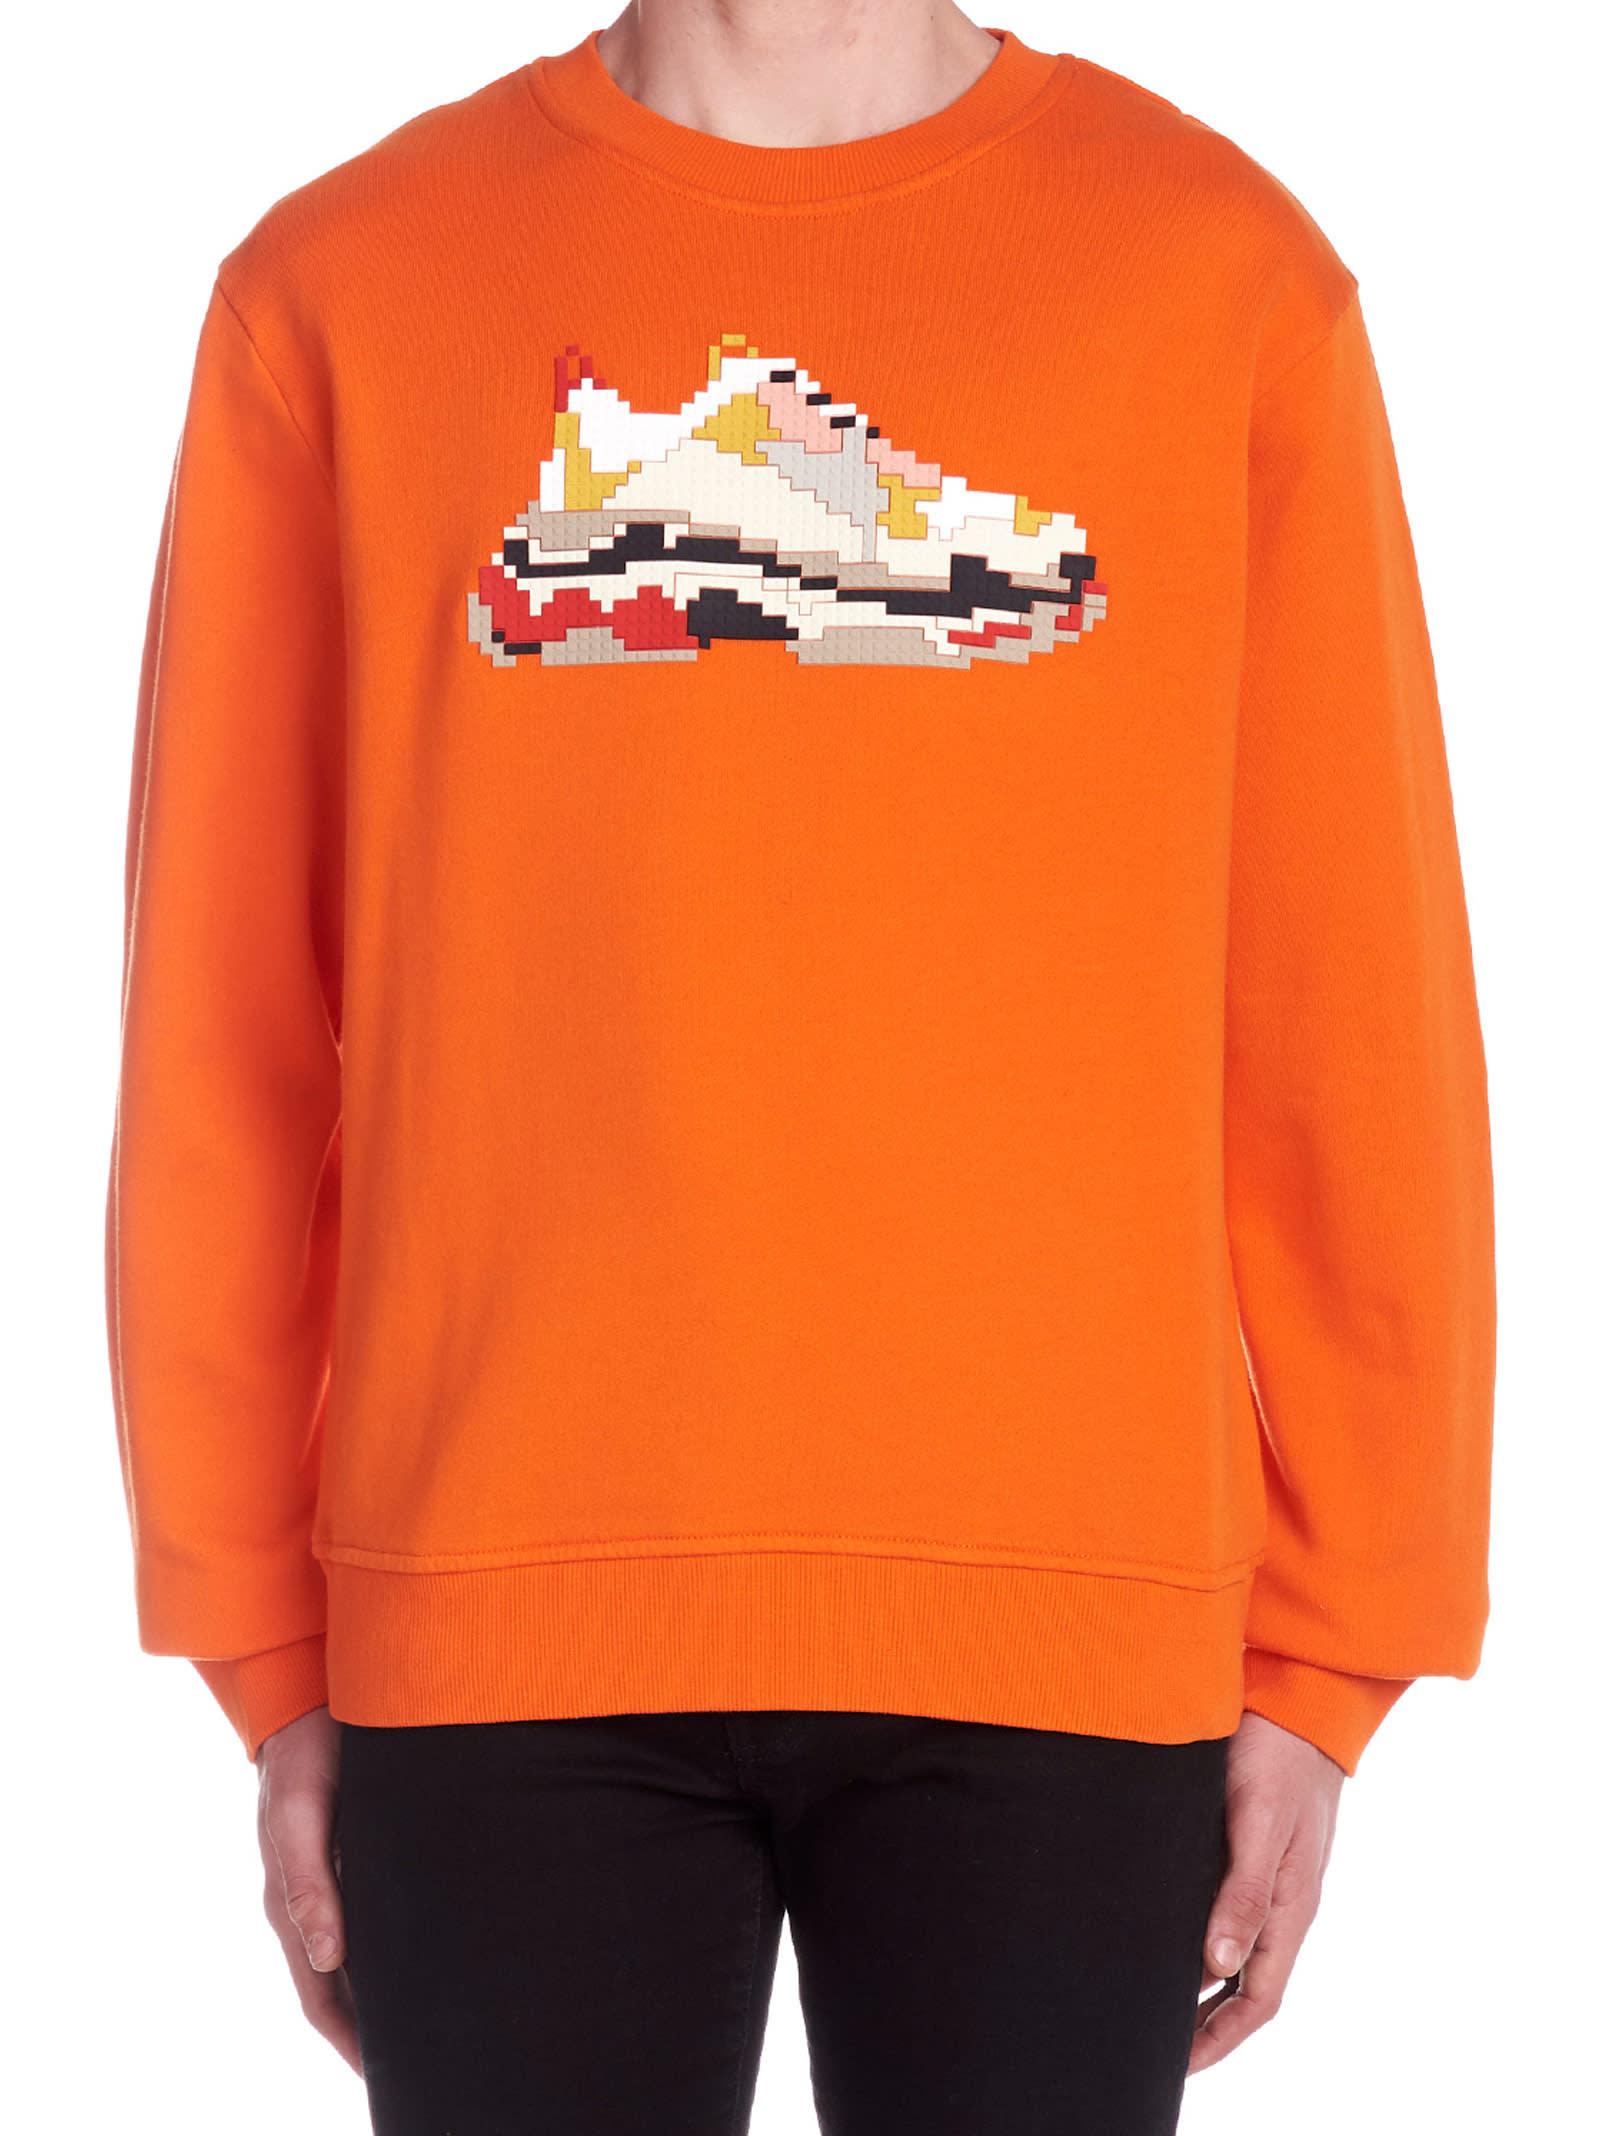 8-bit By Mostly Heard Rarely Seen dadcore Sweatshirt